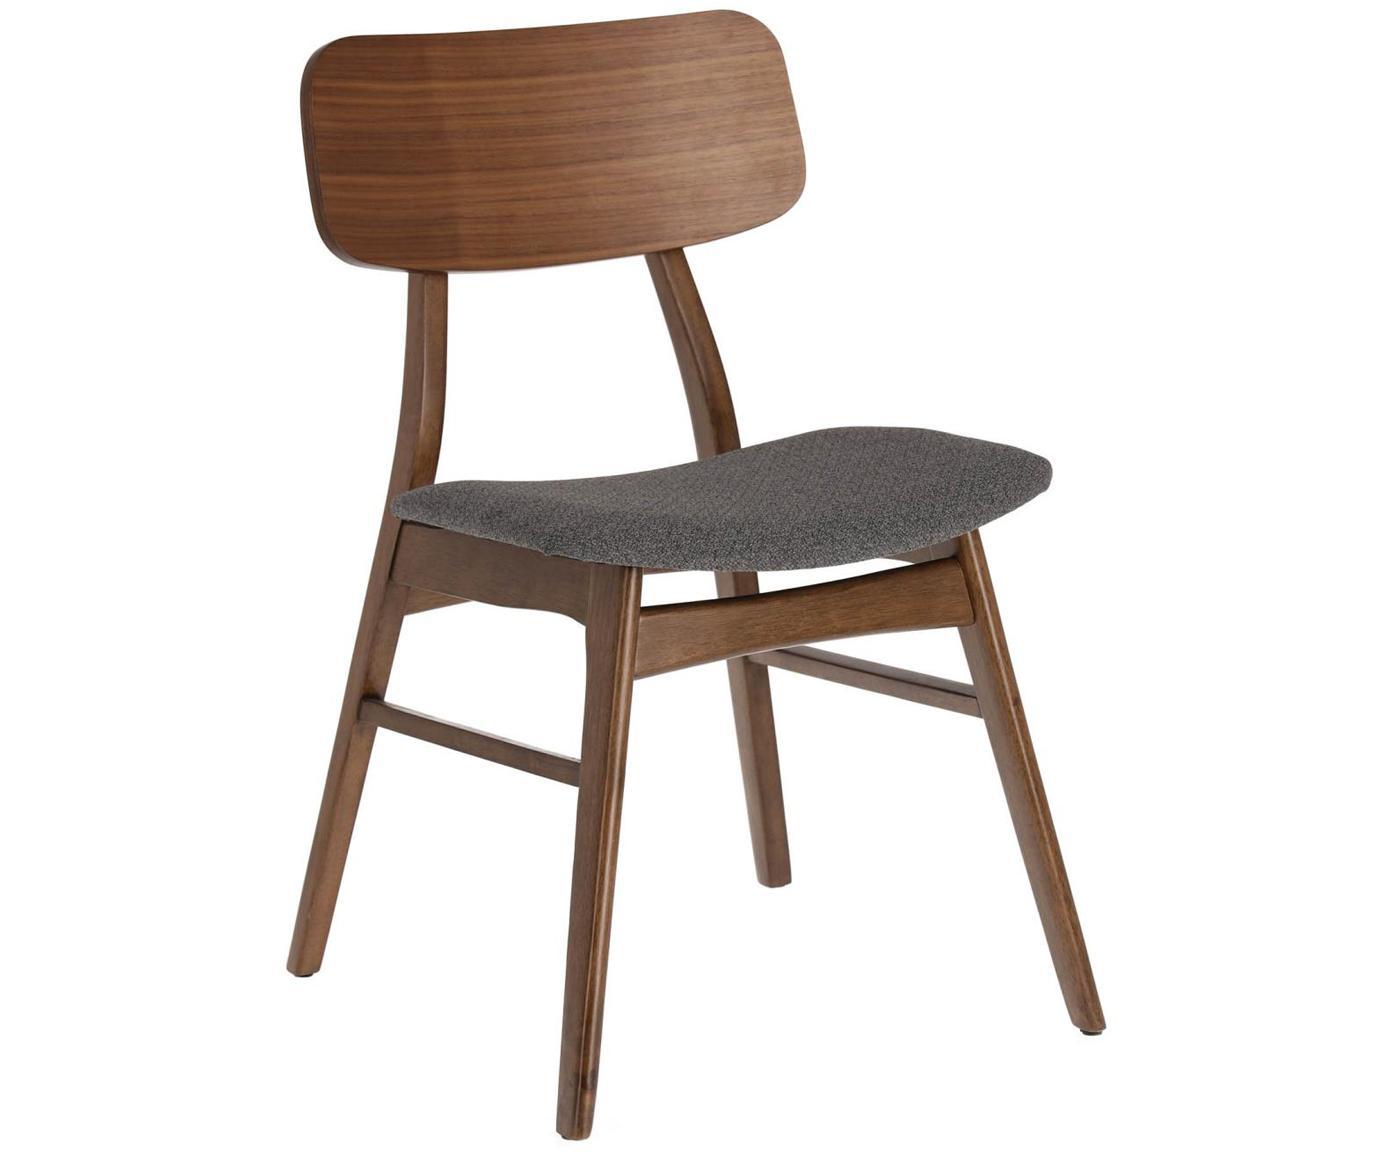 Holzstühle Selia, 2 Stück, Gestell: Massives Gummibaumholz, W, Bezug: Polyester, Dunkelgrau, Walnuss, 48 x 79 cm